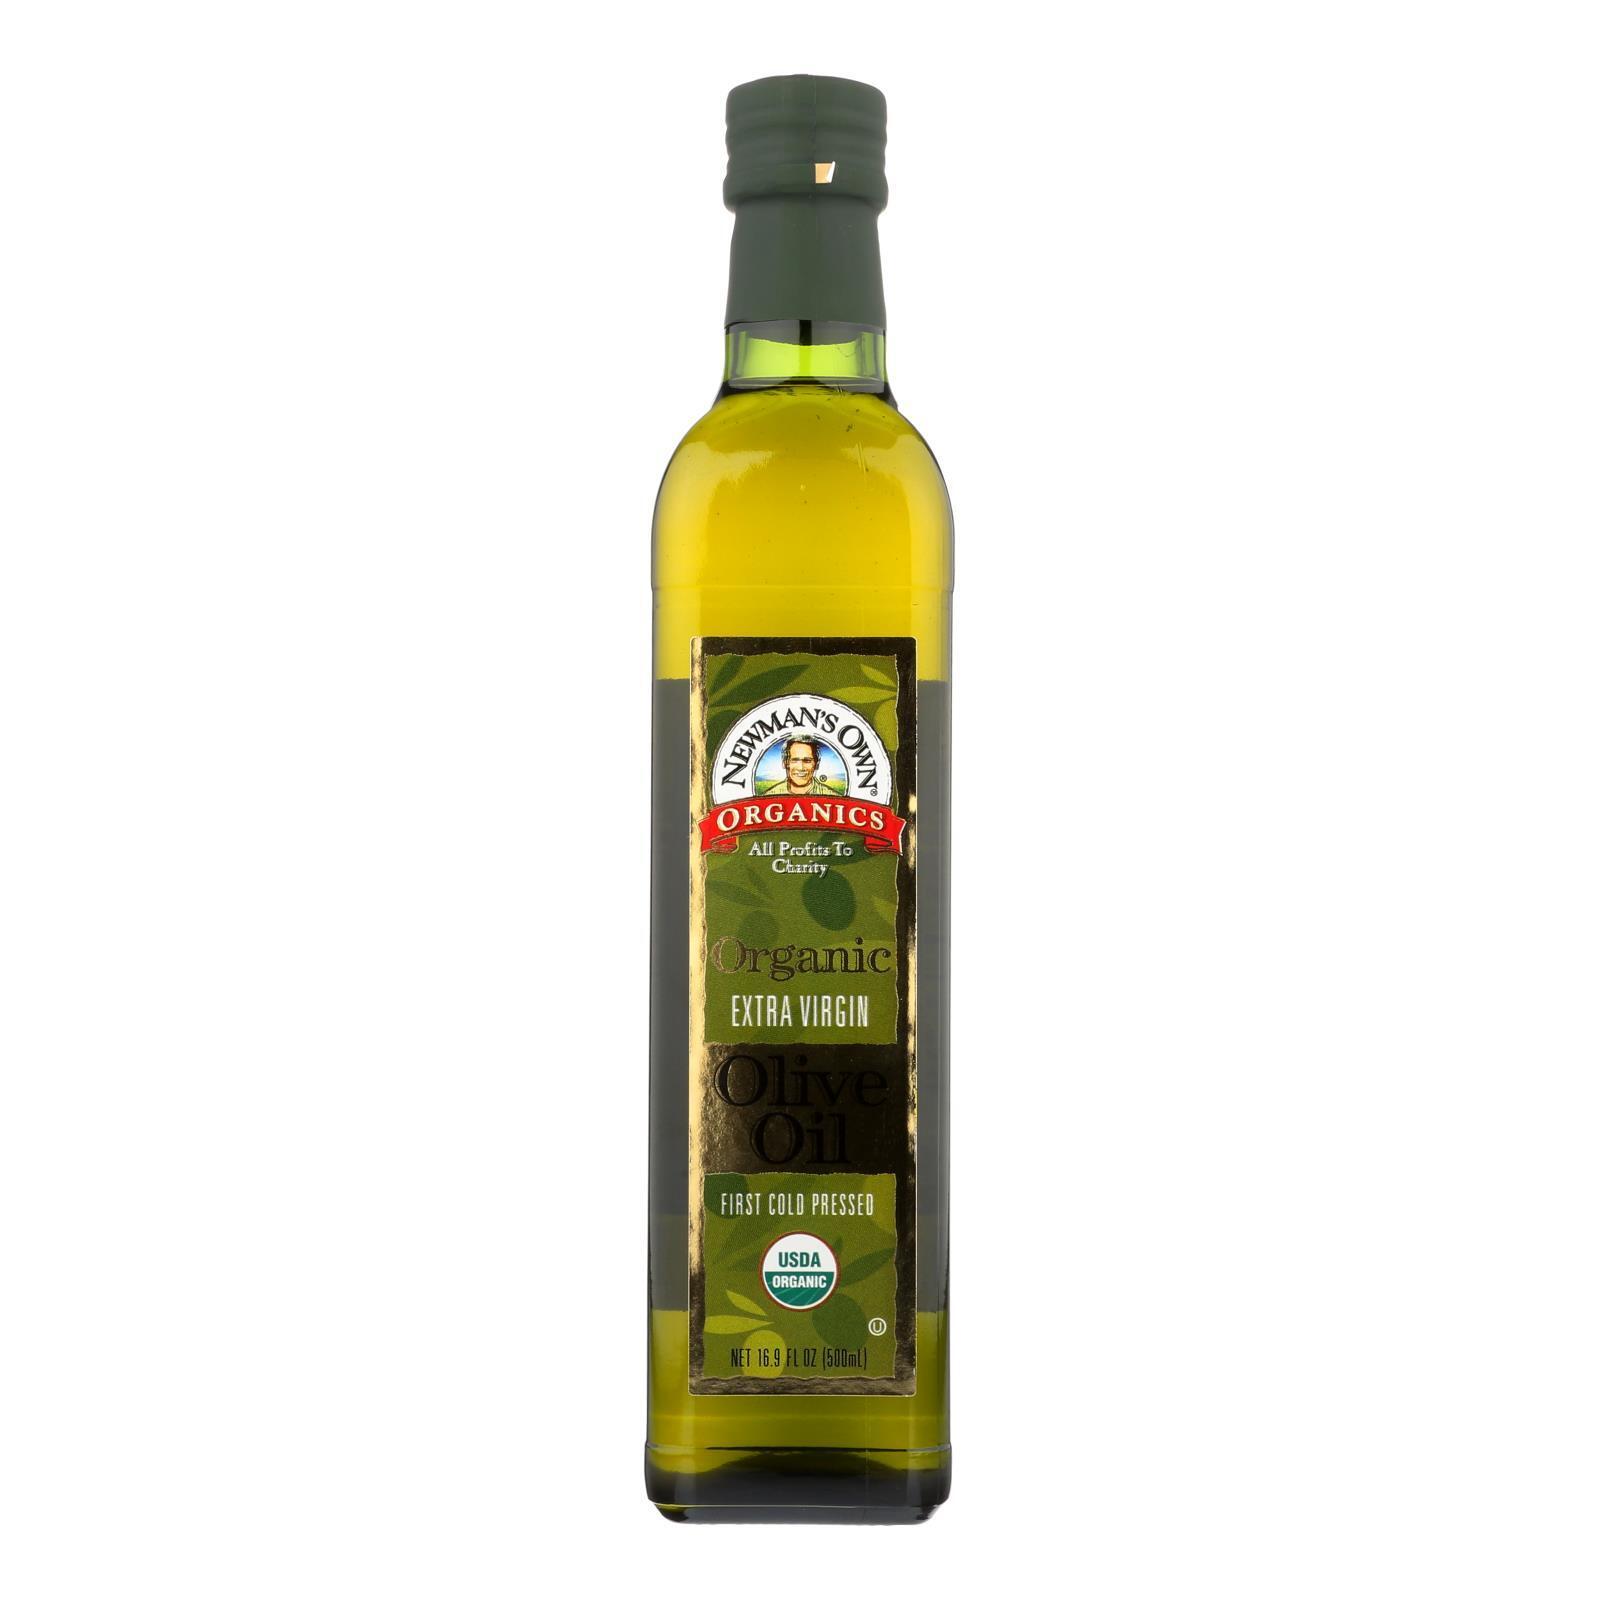 Newman's Own Organics Organic Olive Oil  - Case of 6 - 16.9 Fl oz.